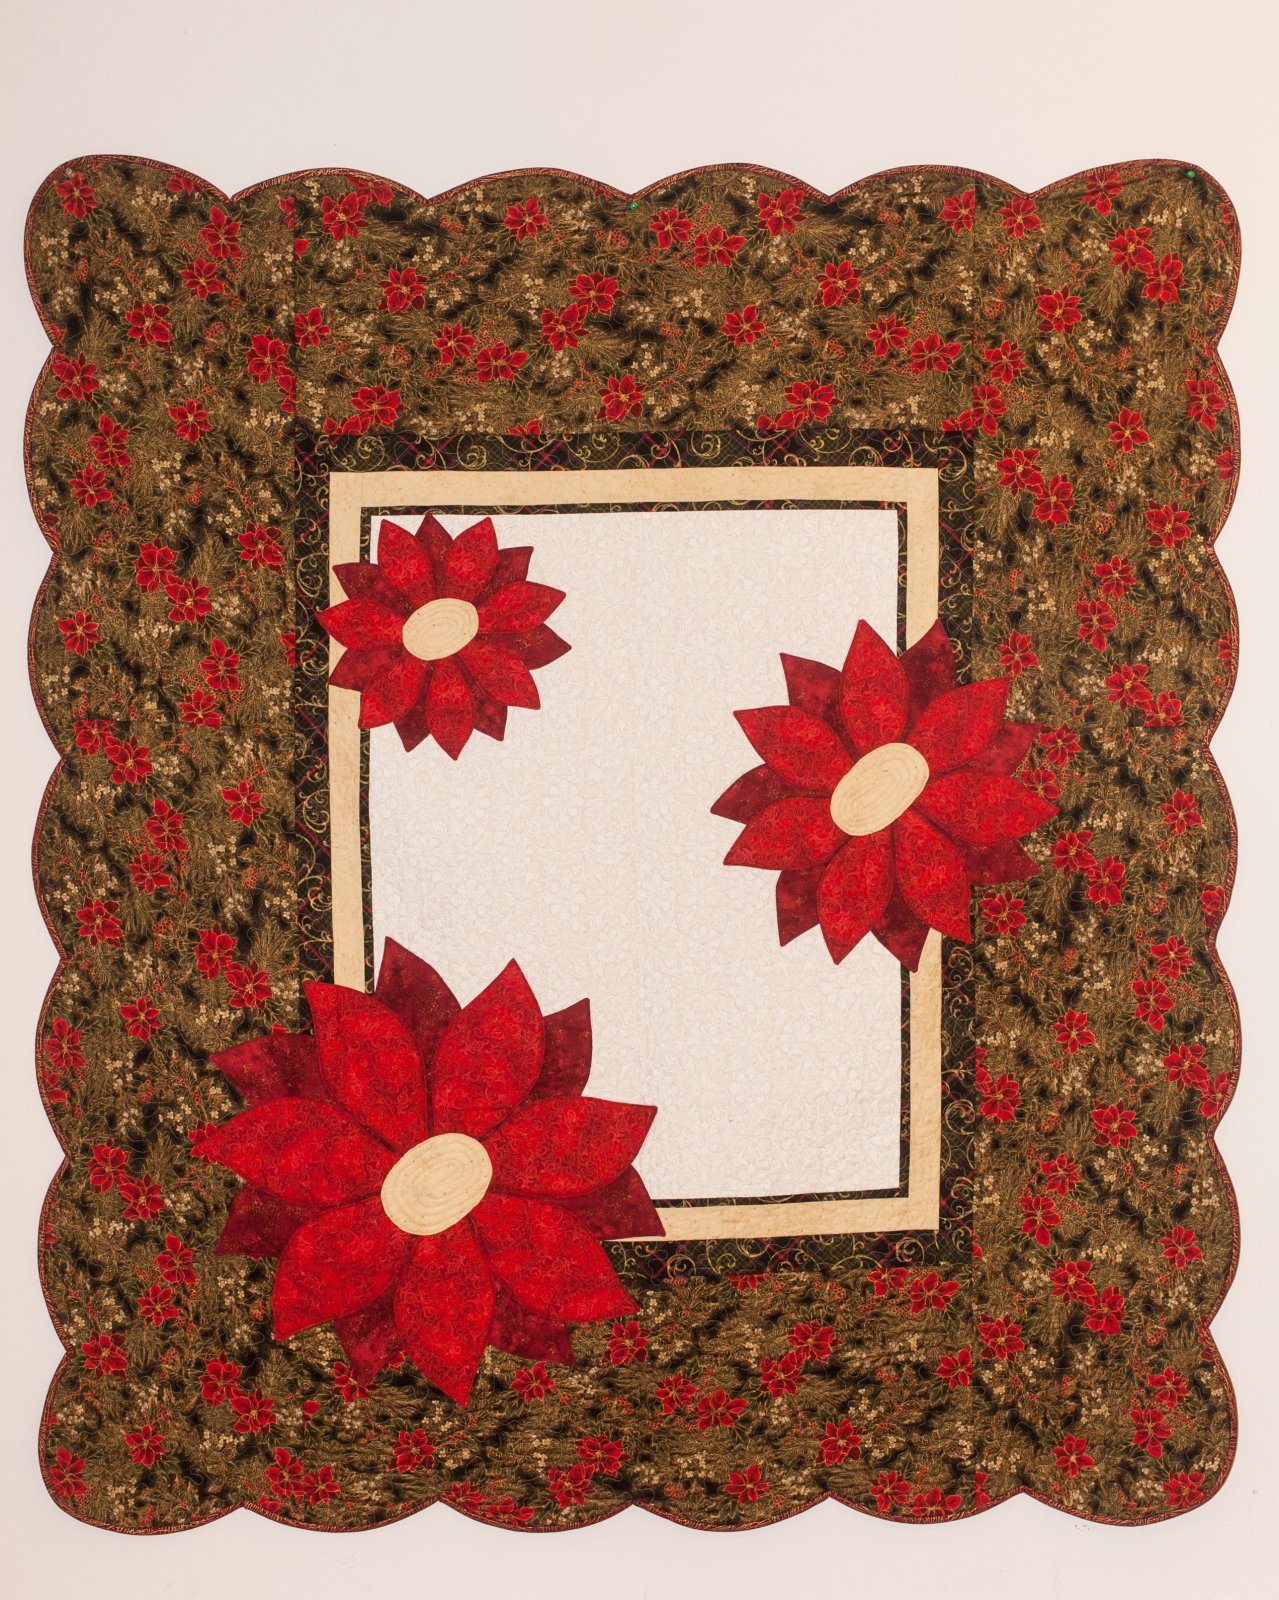 Poinsettia  63 x 70